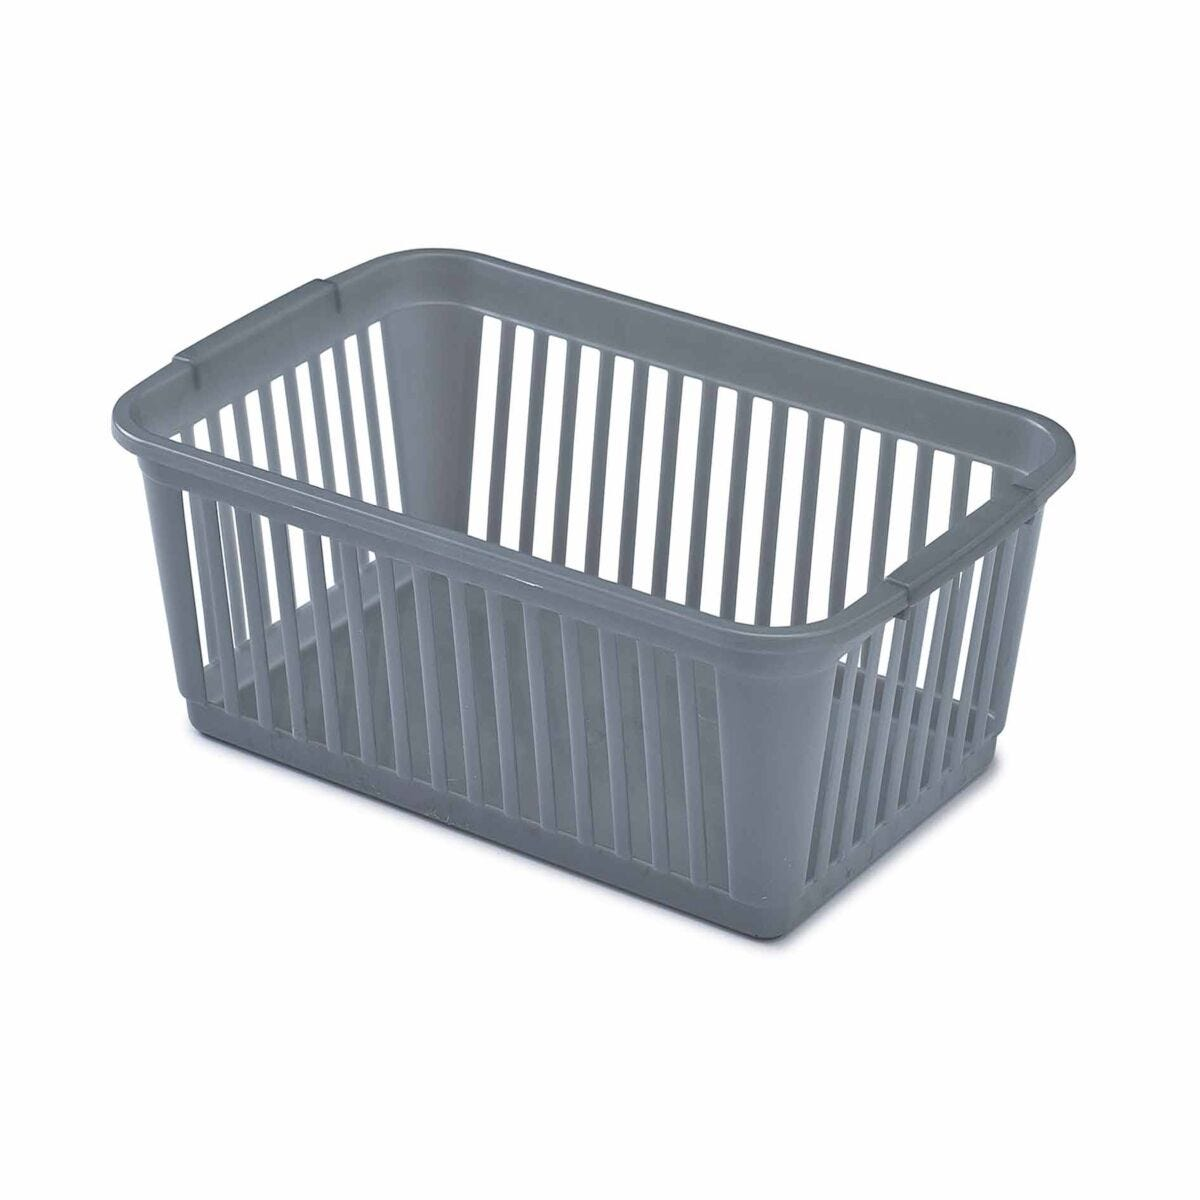 Whitefurze Handy Basket 25cm Pack of 5